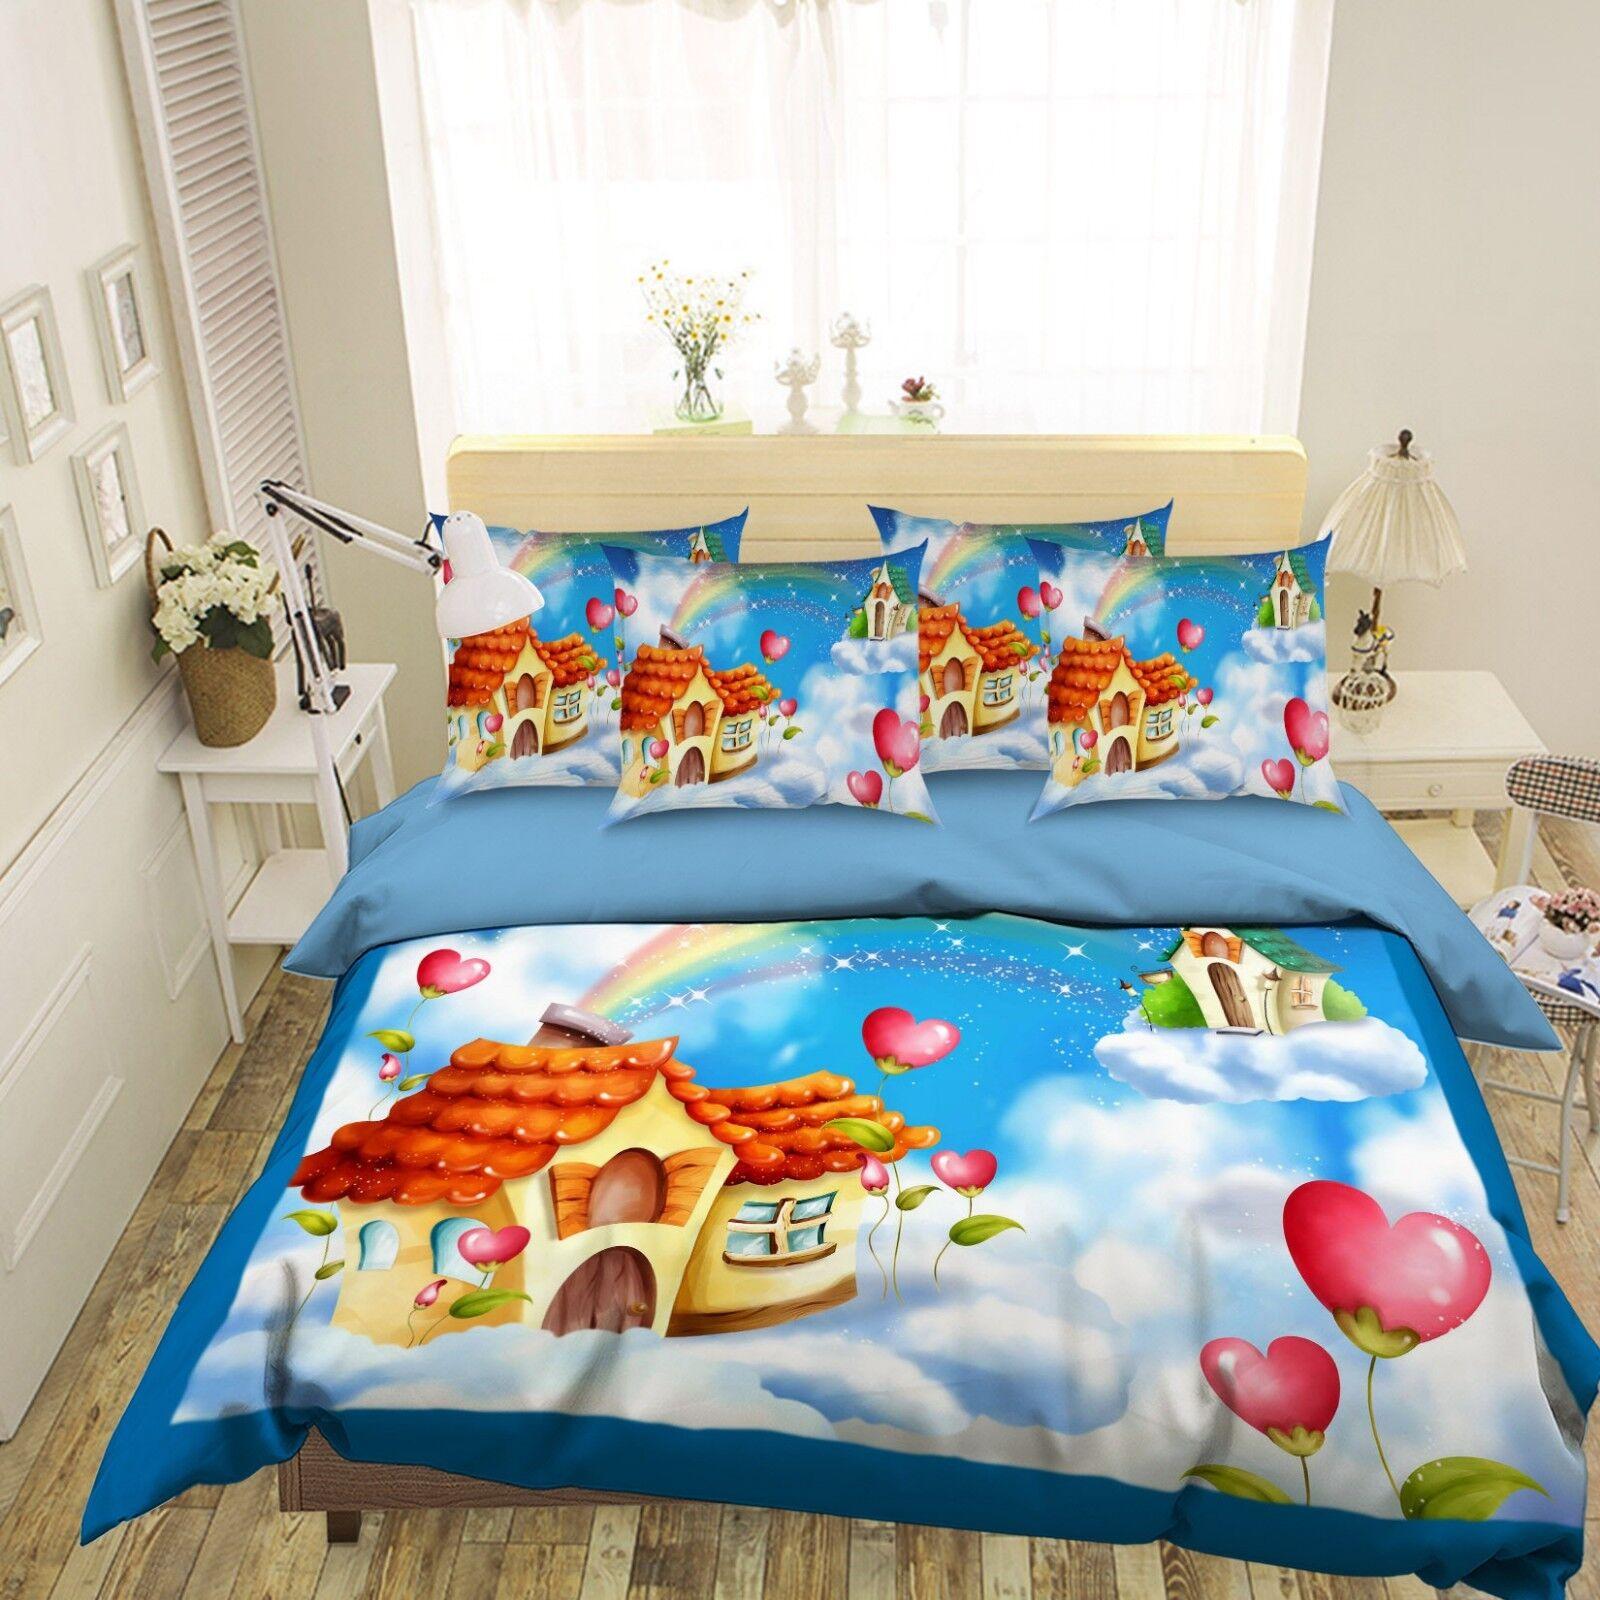 3D Clouds Houses 686 Bed Pillowcases Quilt Duvet Cover Set Single King UK Summer